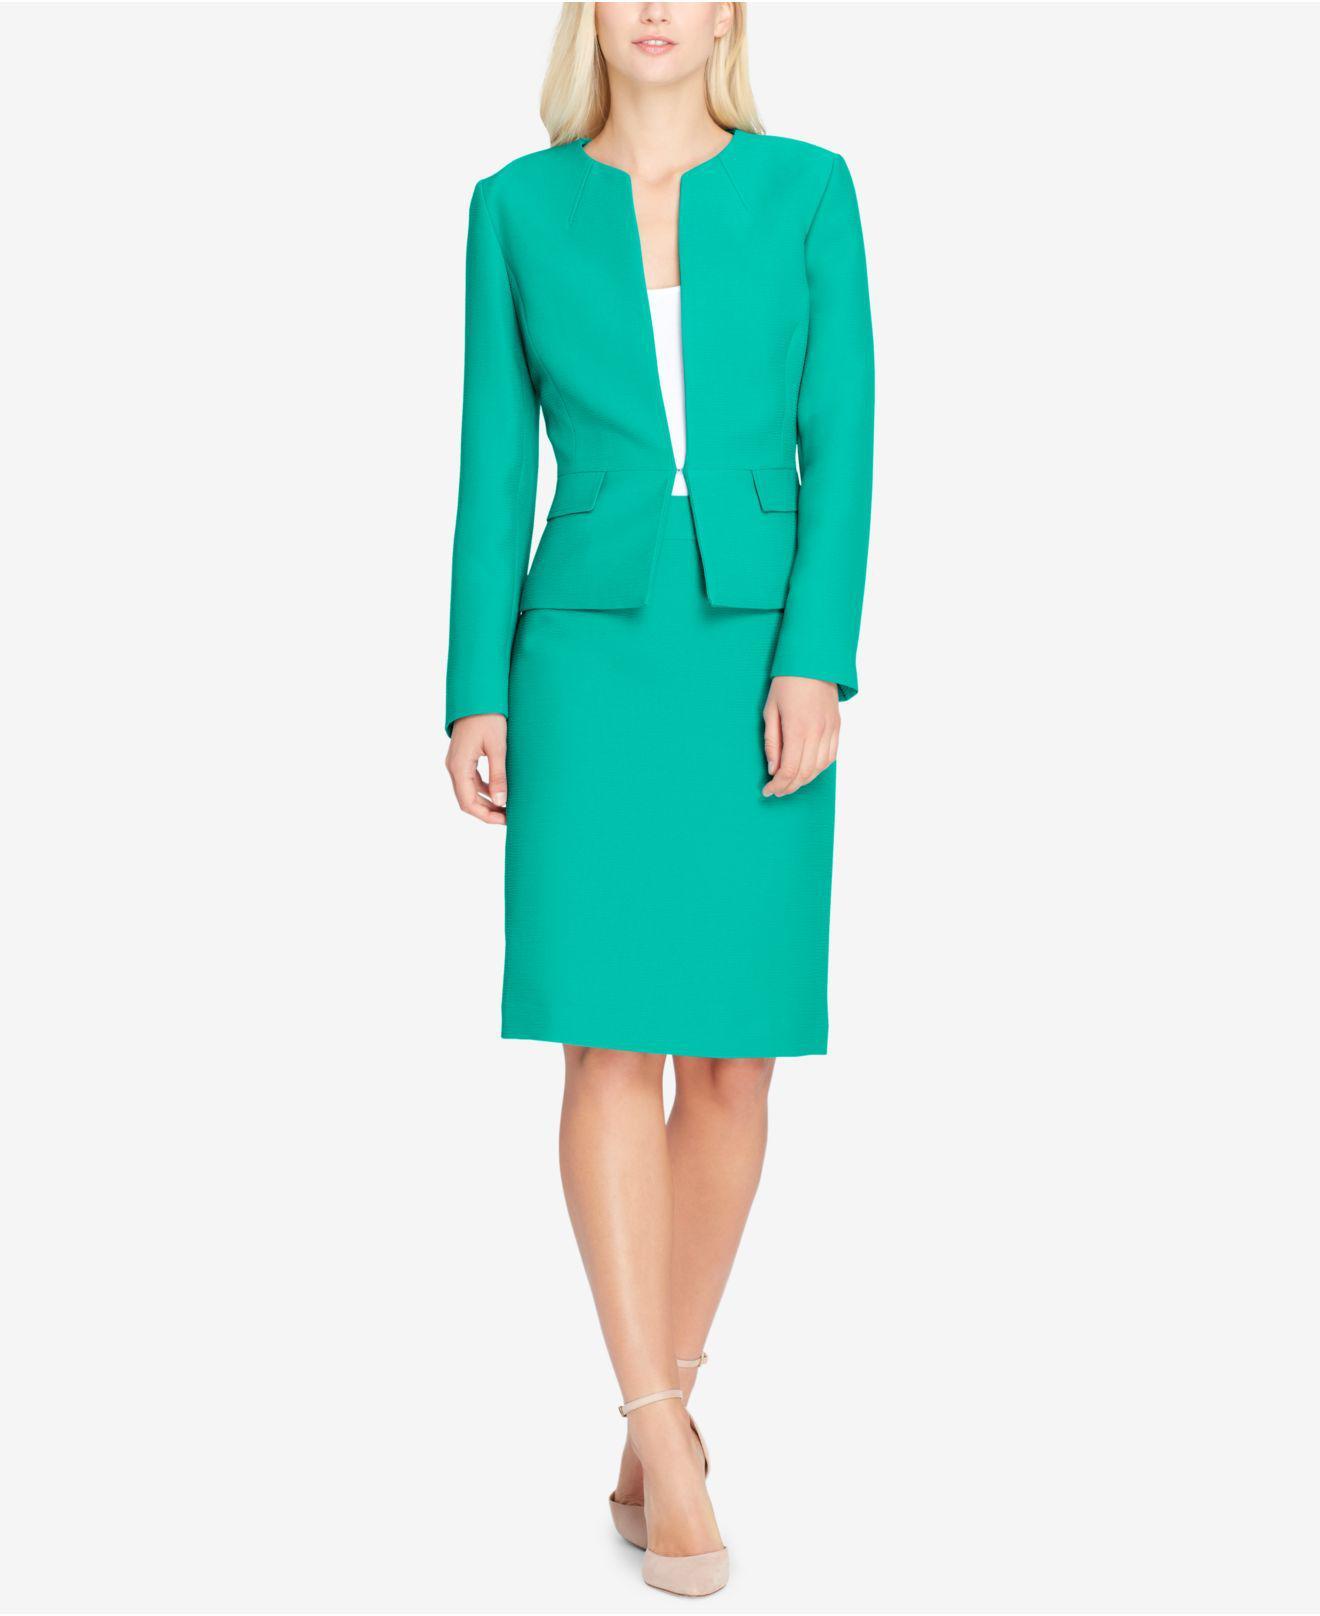 Lyst - Tahari Peplum Skirt Suit in Green - Save 47%